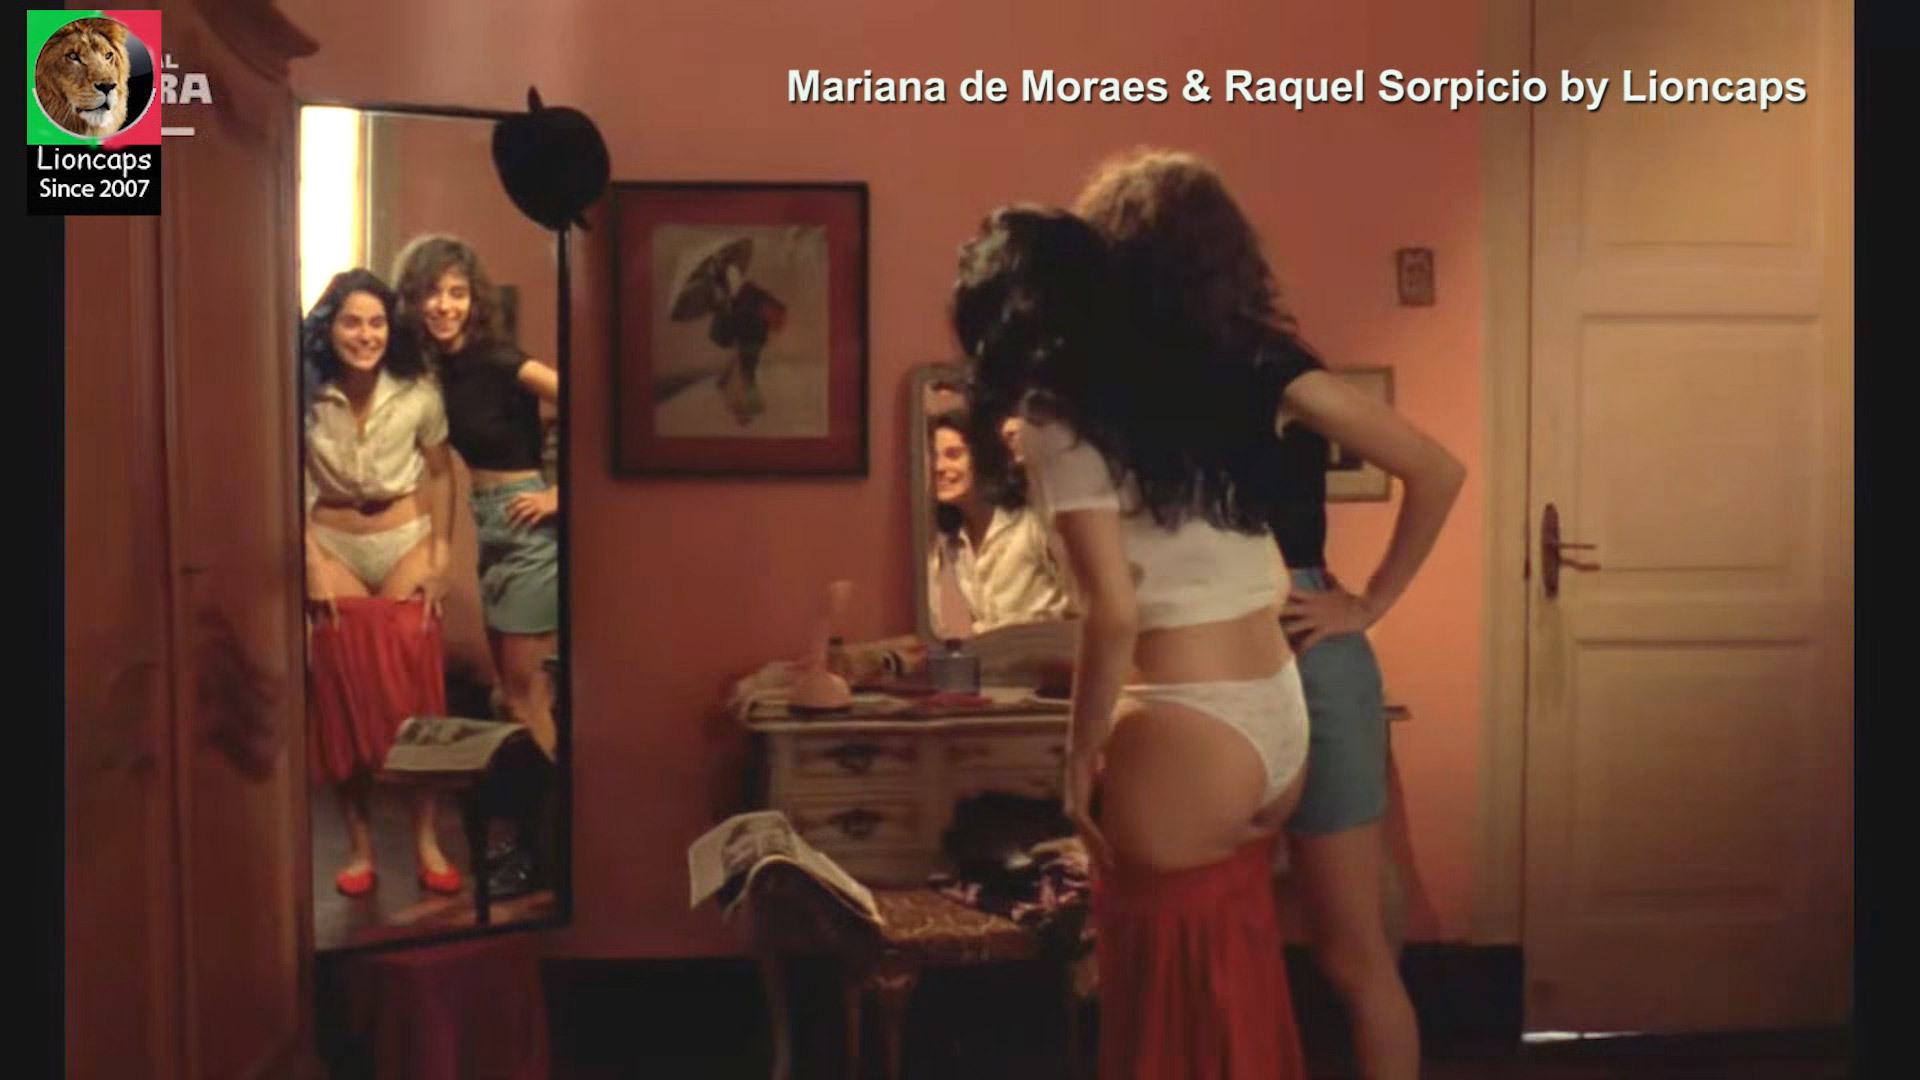 mariana_moraes_raquel_sorpicio_matou_familia_lioncaps_29_11_2020_1a (3).jpg